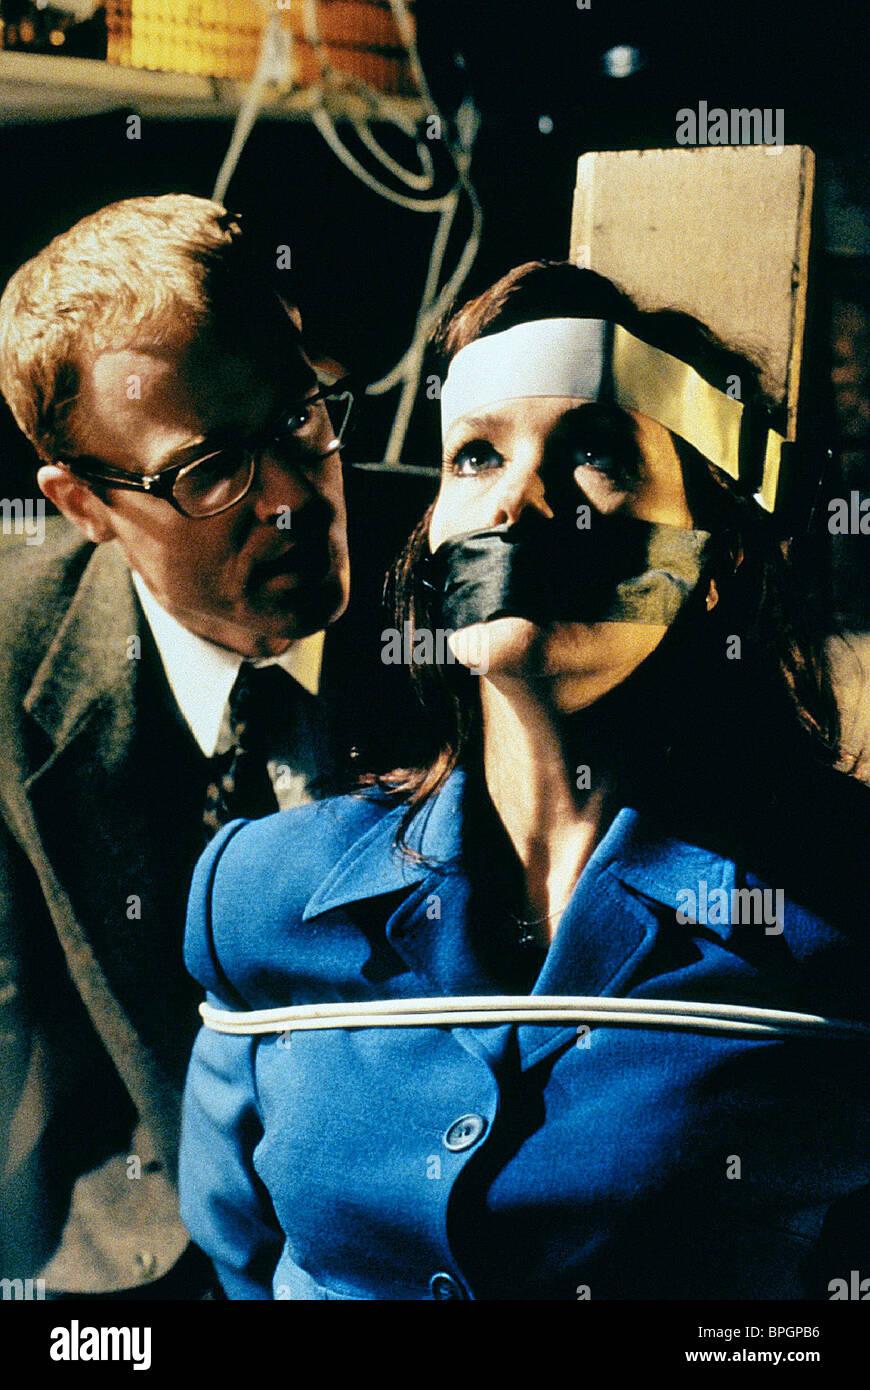 DAVID LEWIS & JANINE TURNER FATAL ERROR (1999) - Stock Image